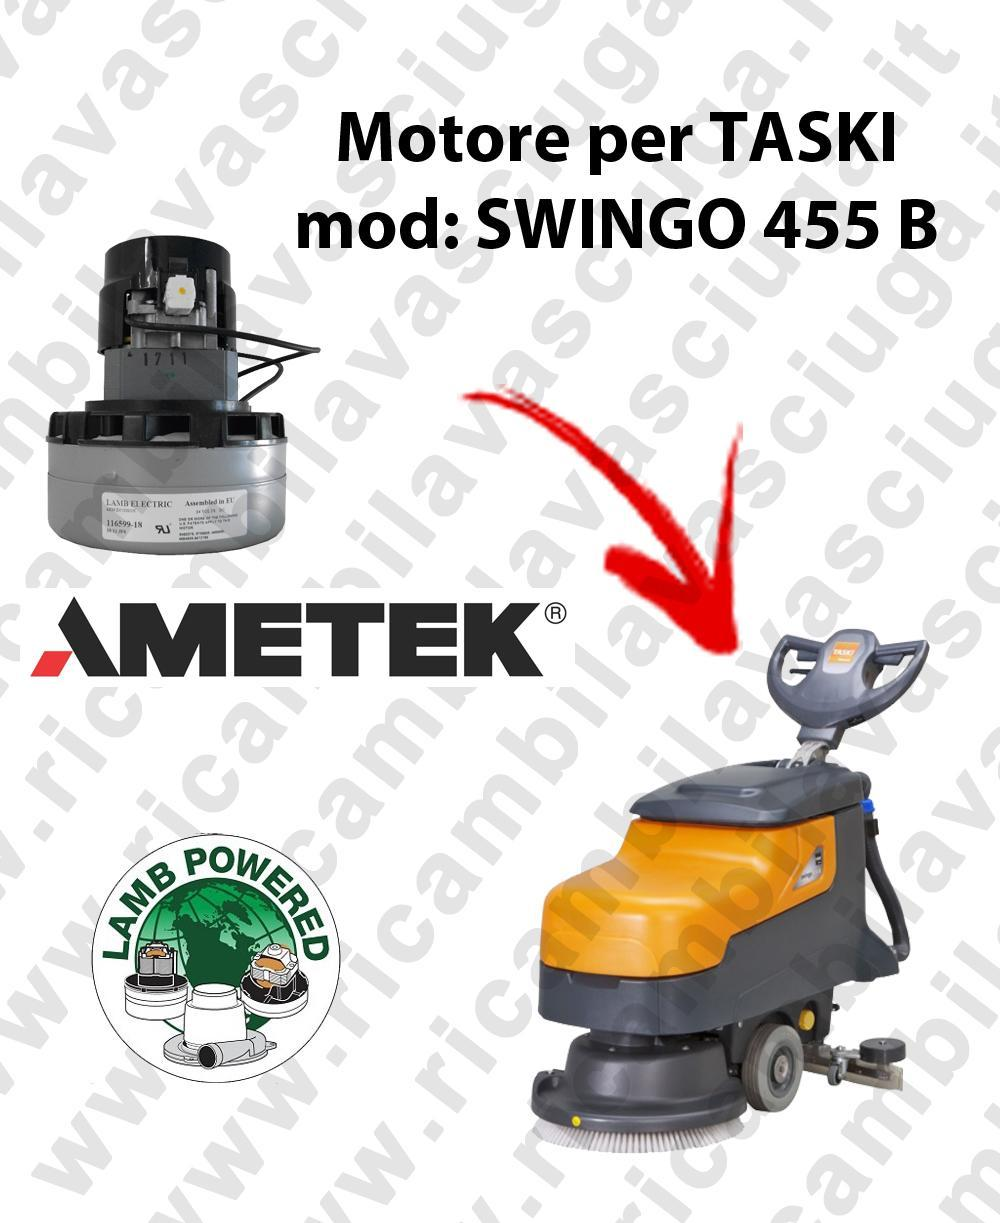 SWINGO 455 B MOTEUR ASPIRATION LAMB AMATEK pour autolaveuses TASKI